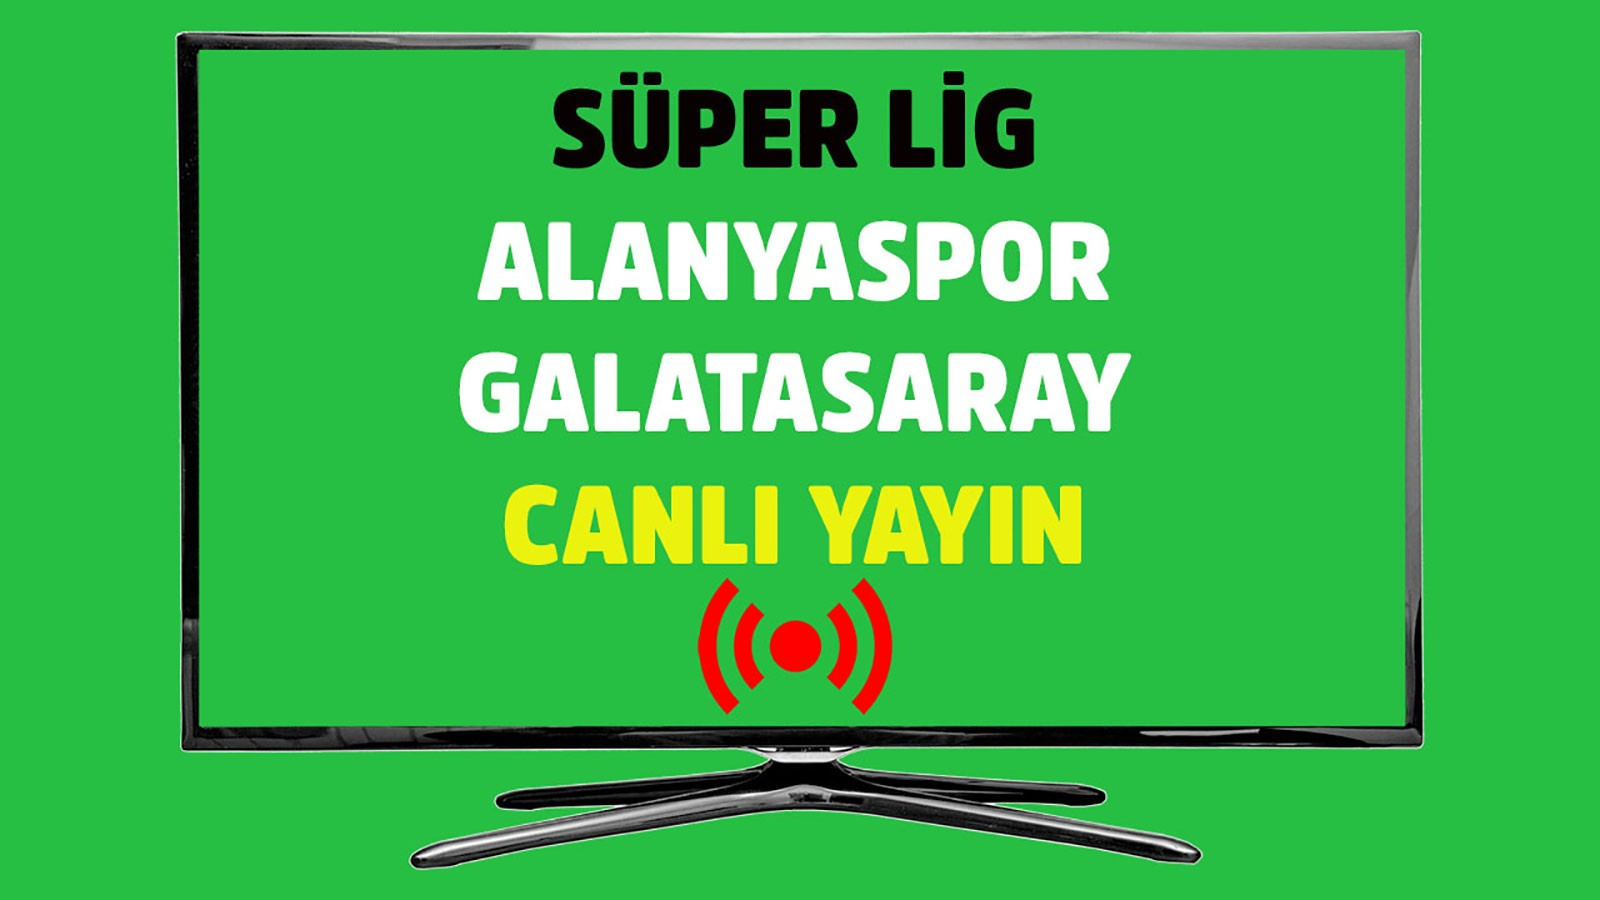 CANLI Alanyaspor - Galatasaray